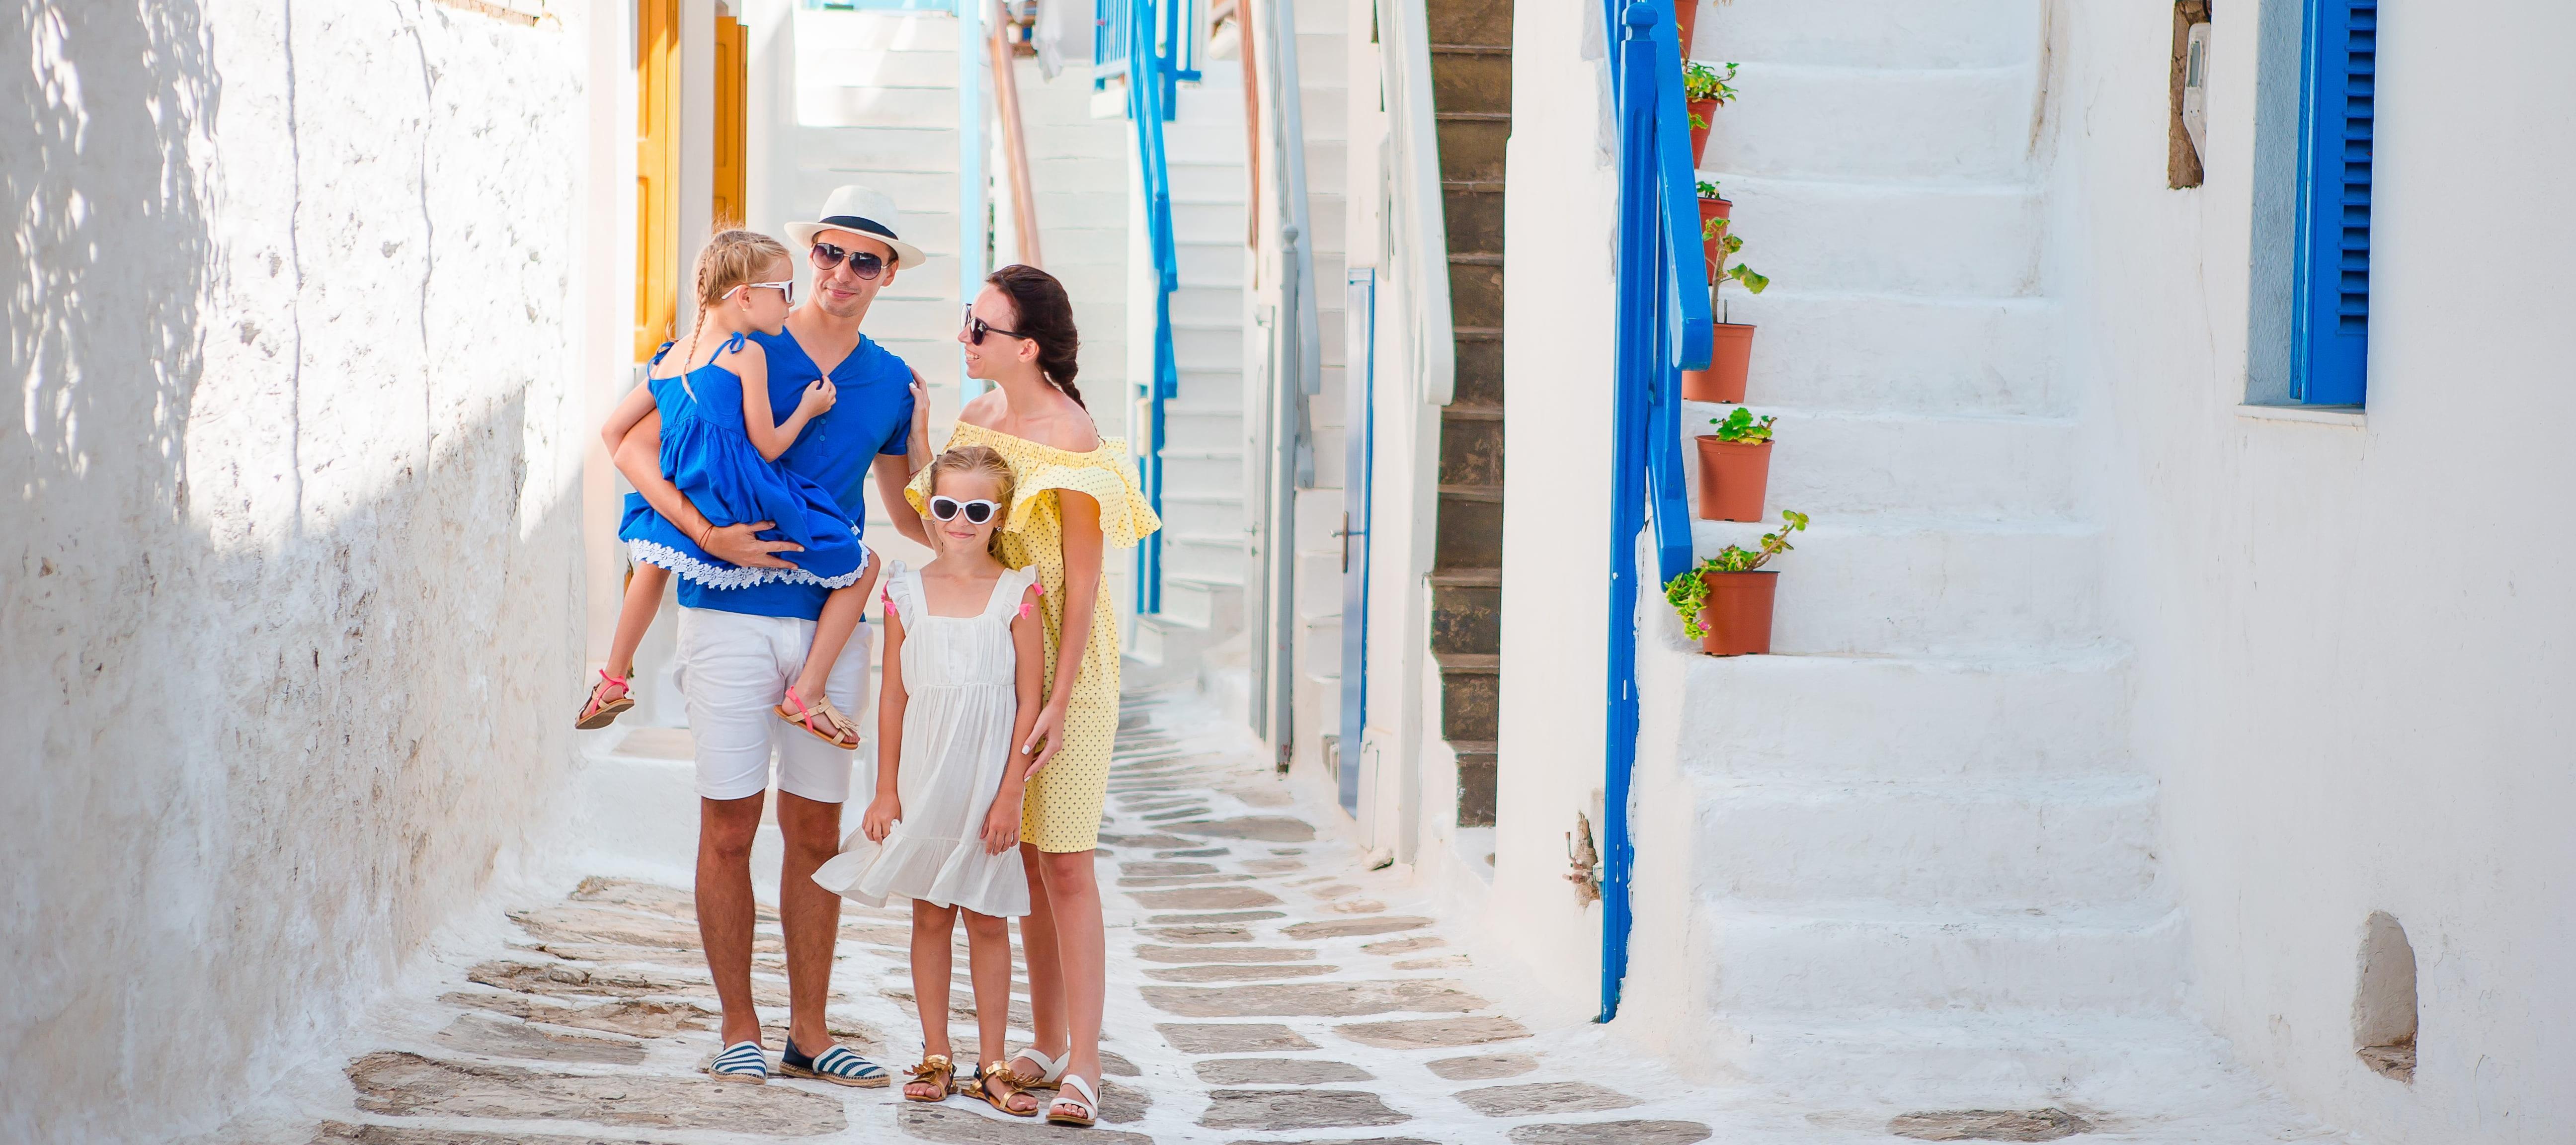 Family with 2 children in a sun destination